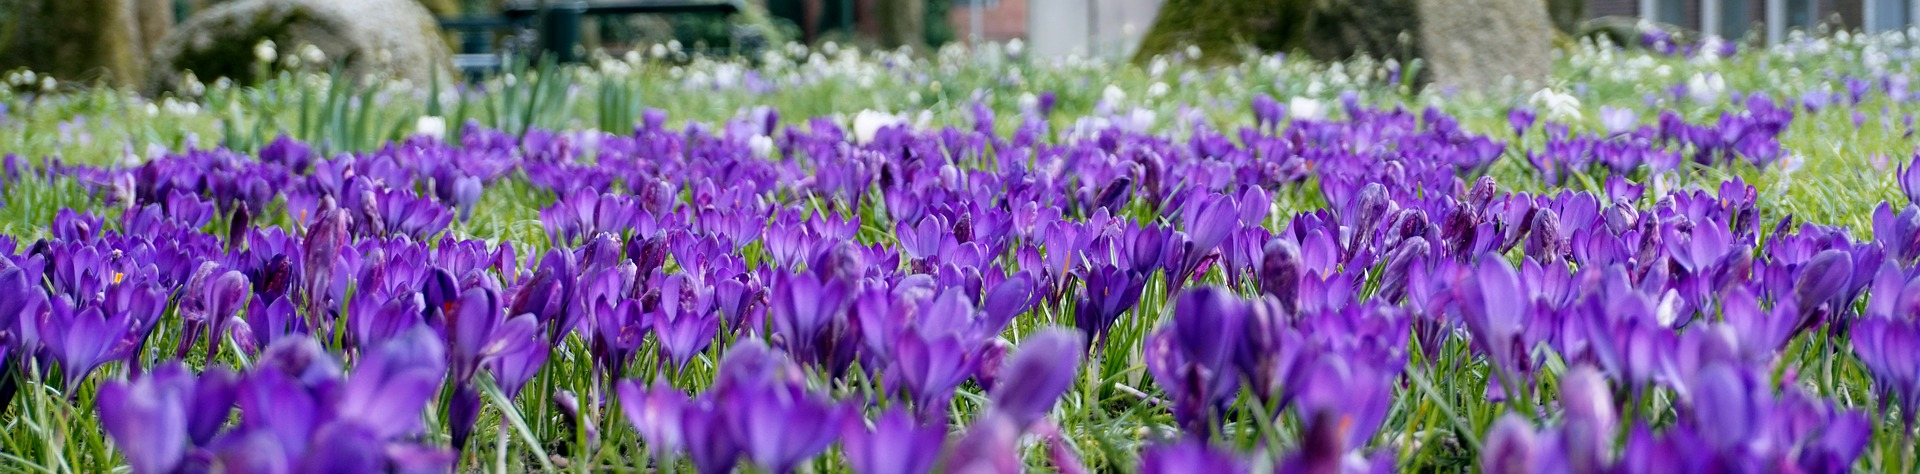 purple-3284962-1920.jpg